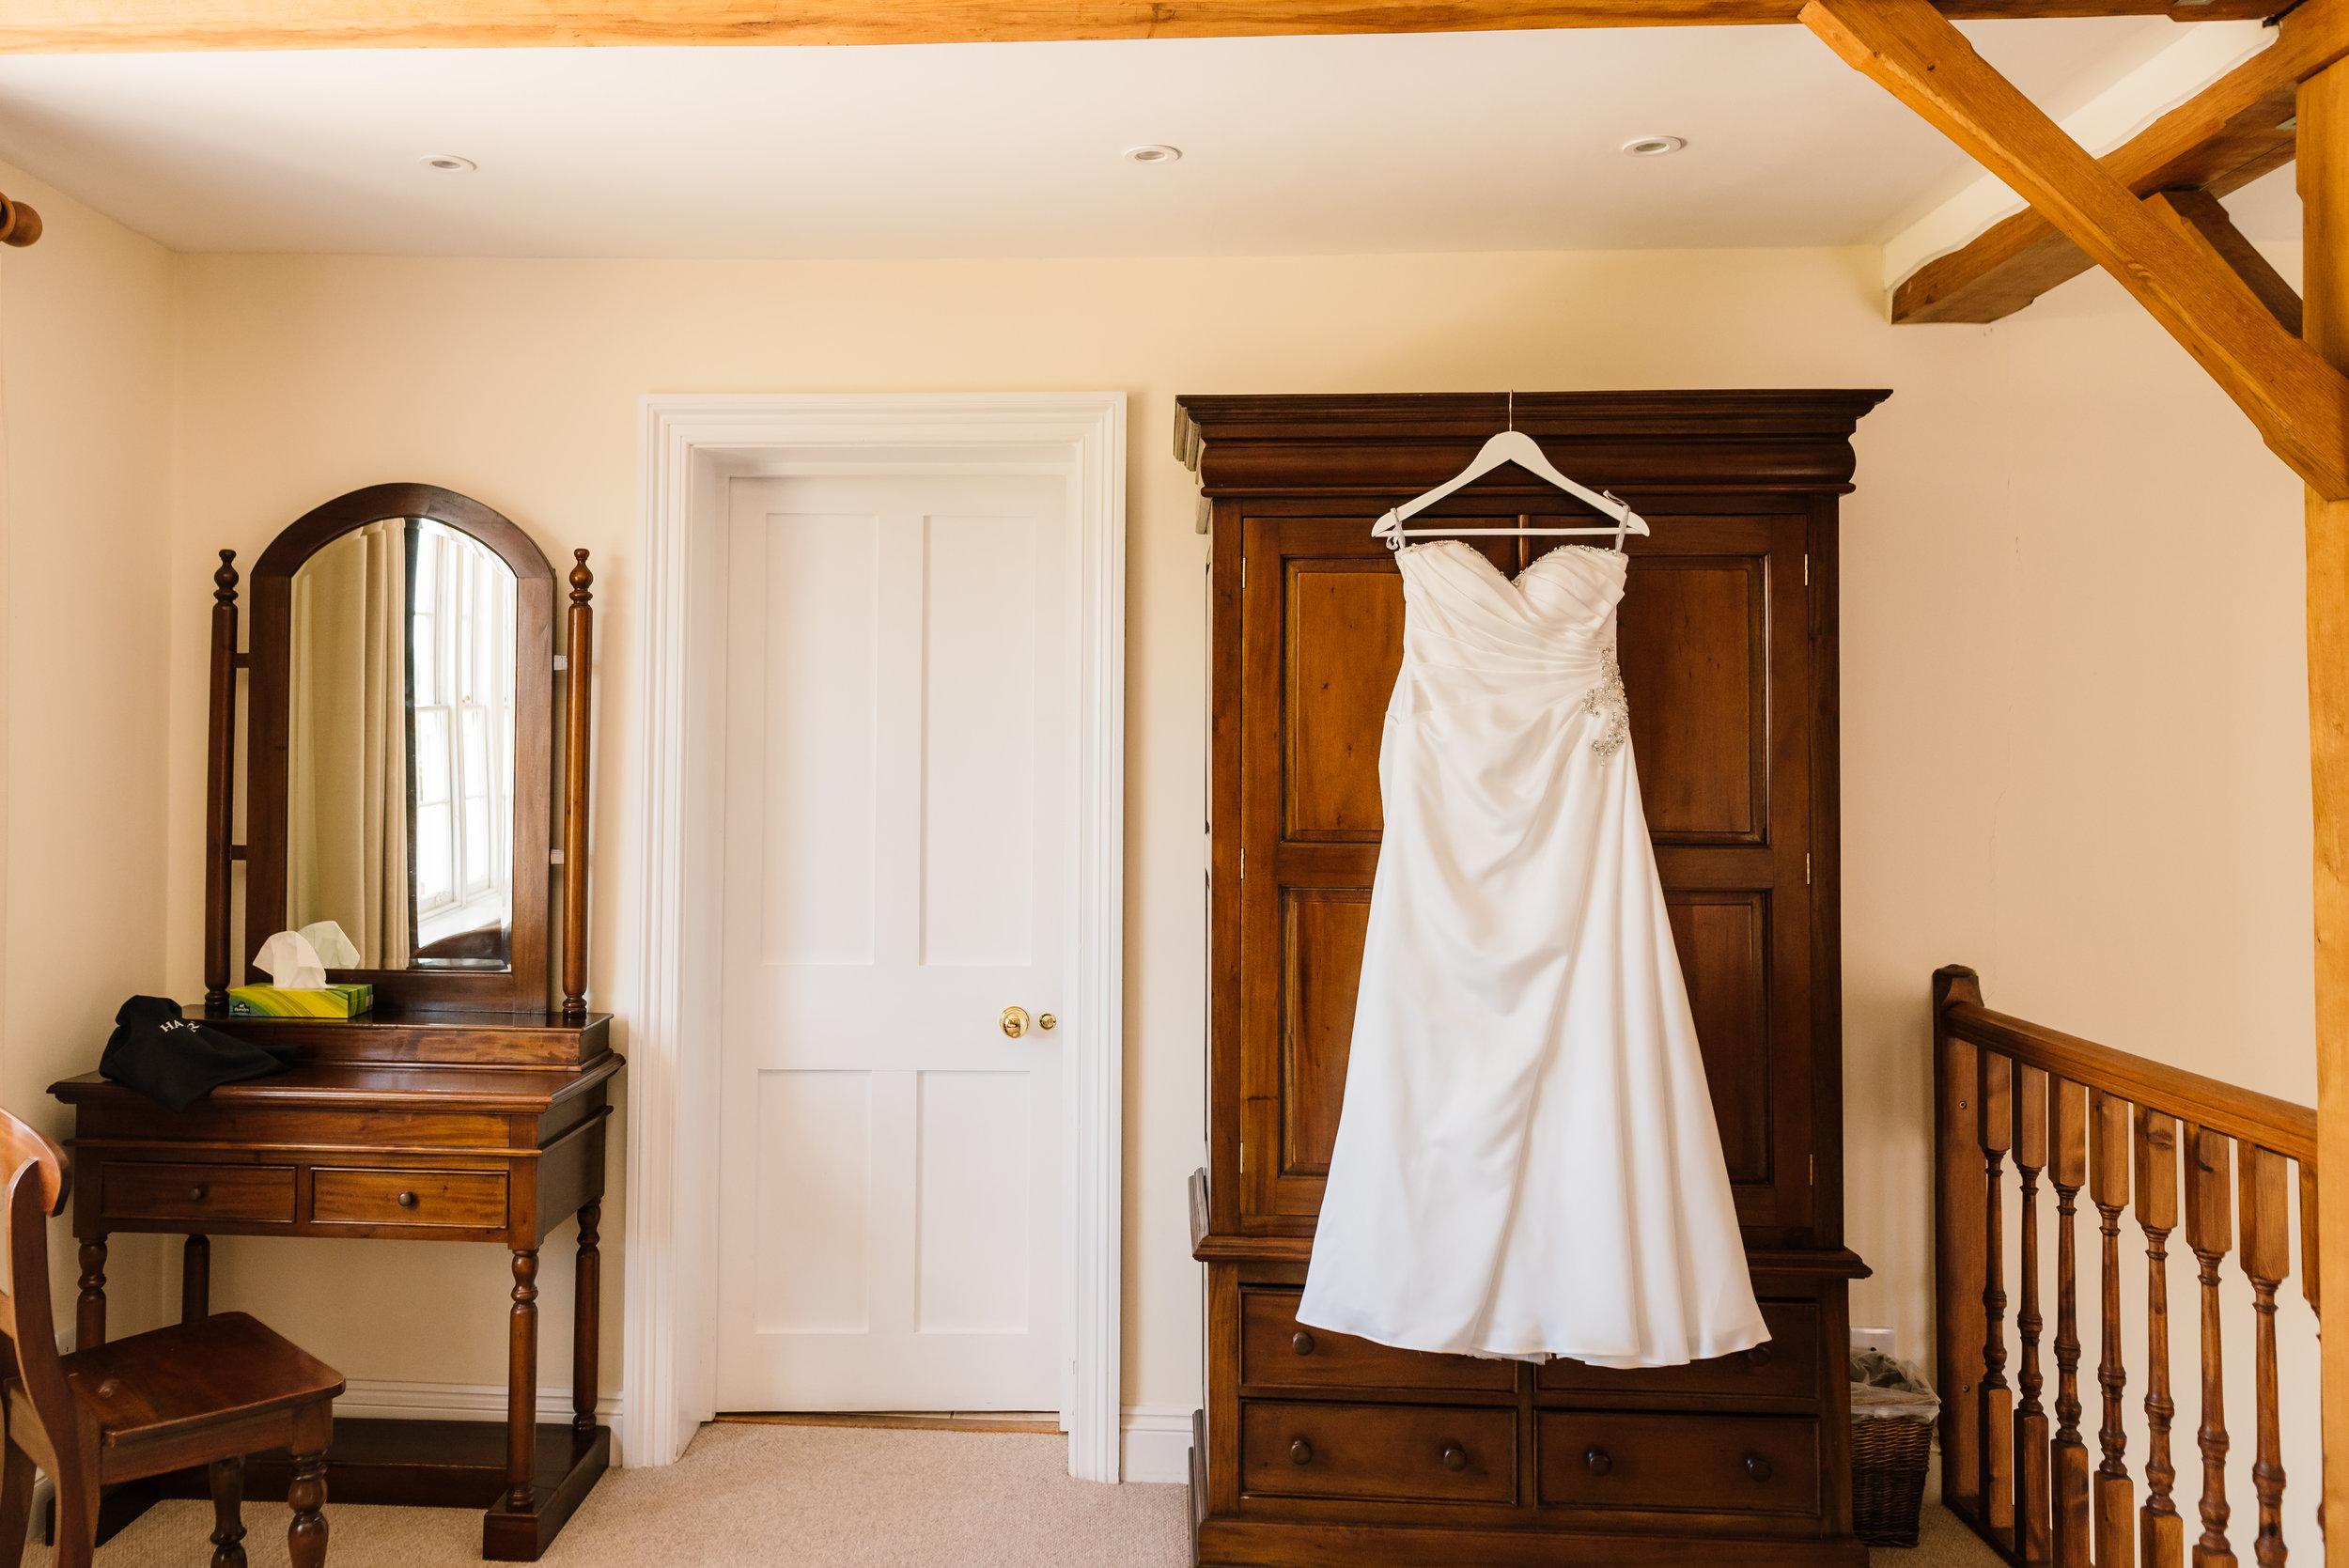 Sarah-Fishlock-Photography / Hampshire-wedding-photographer-Hampshire / Fleet-Wedding-Photographer / Groomed-Farm-Wedding-Hampshire / Farm-Wedding-Venues-Surrey / Farm-Wedding-Venue-Hampshire